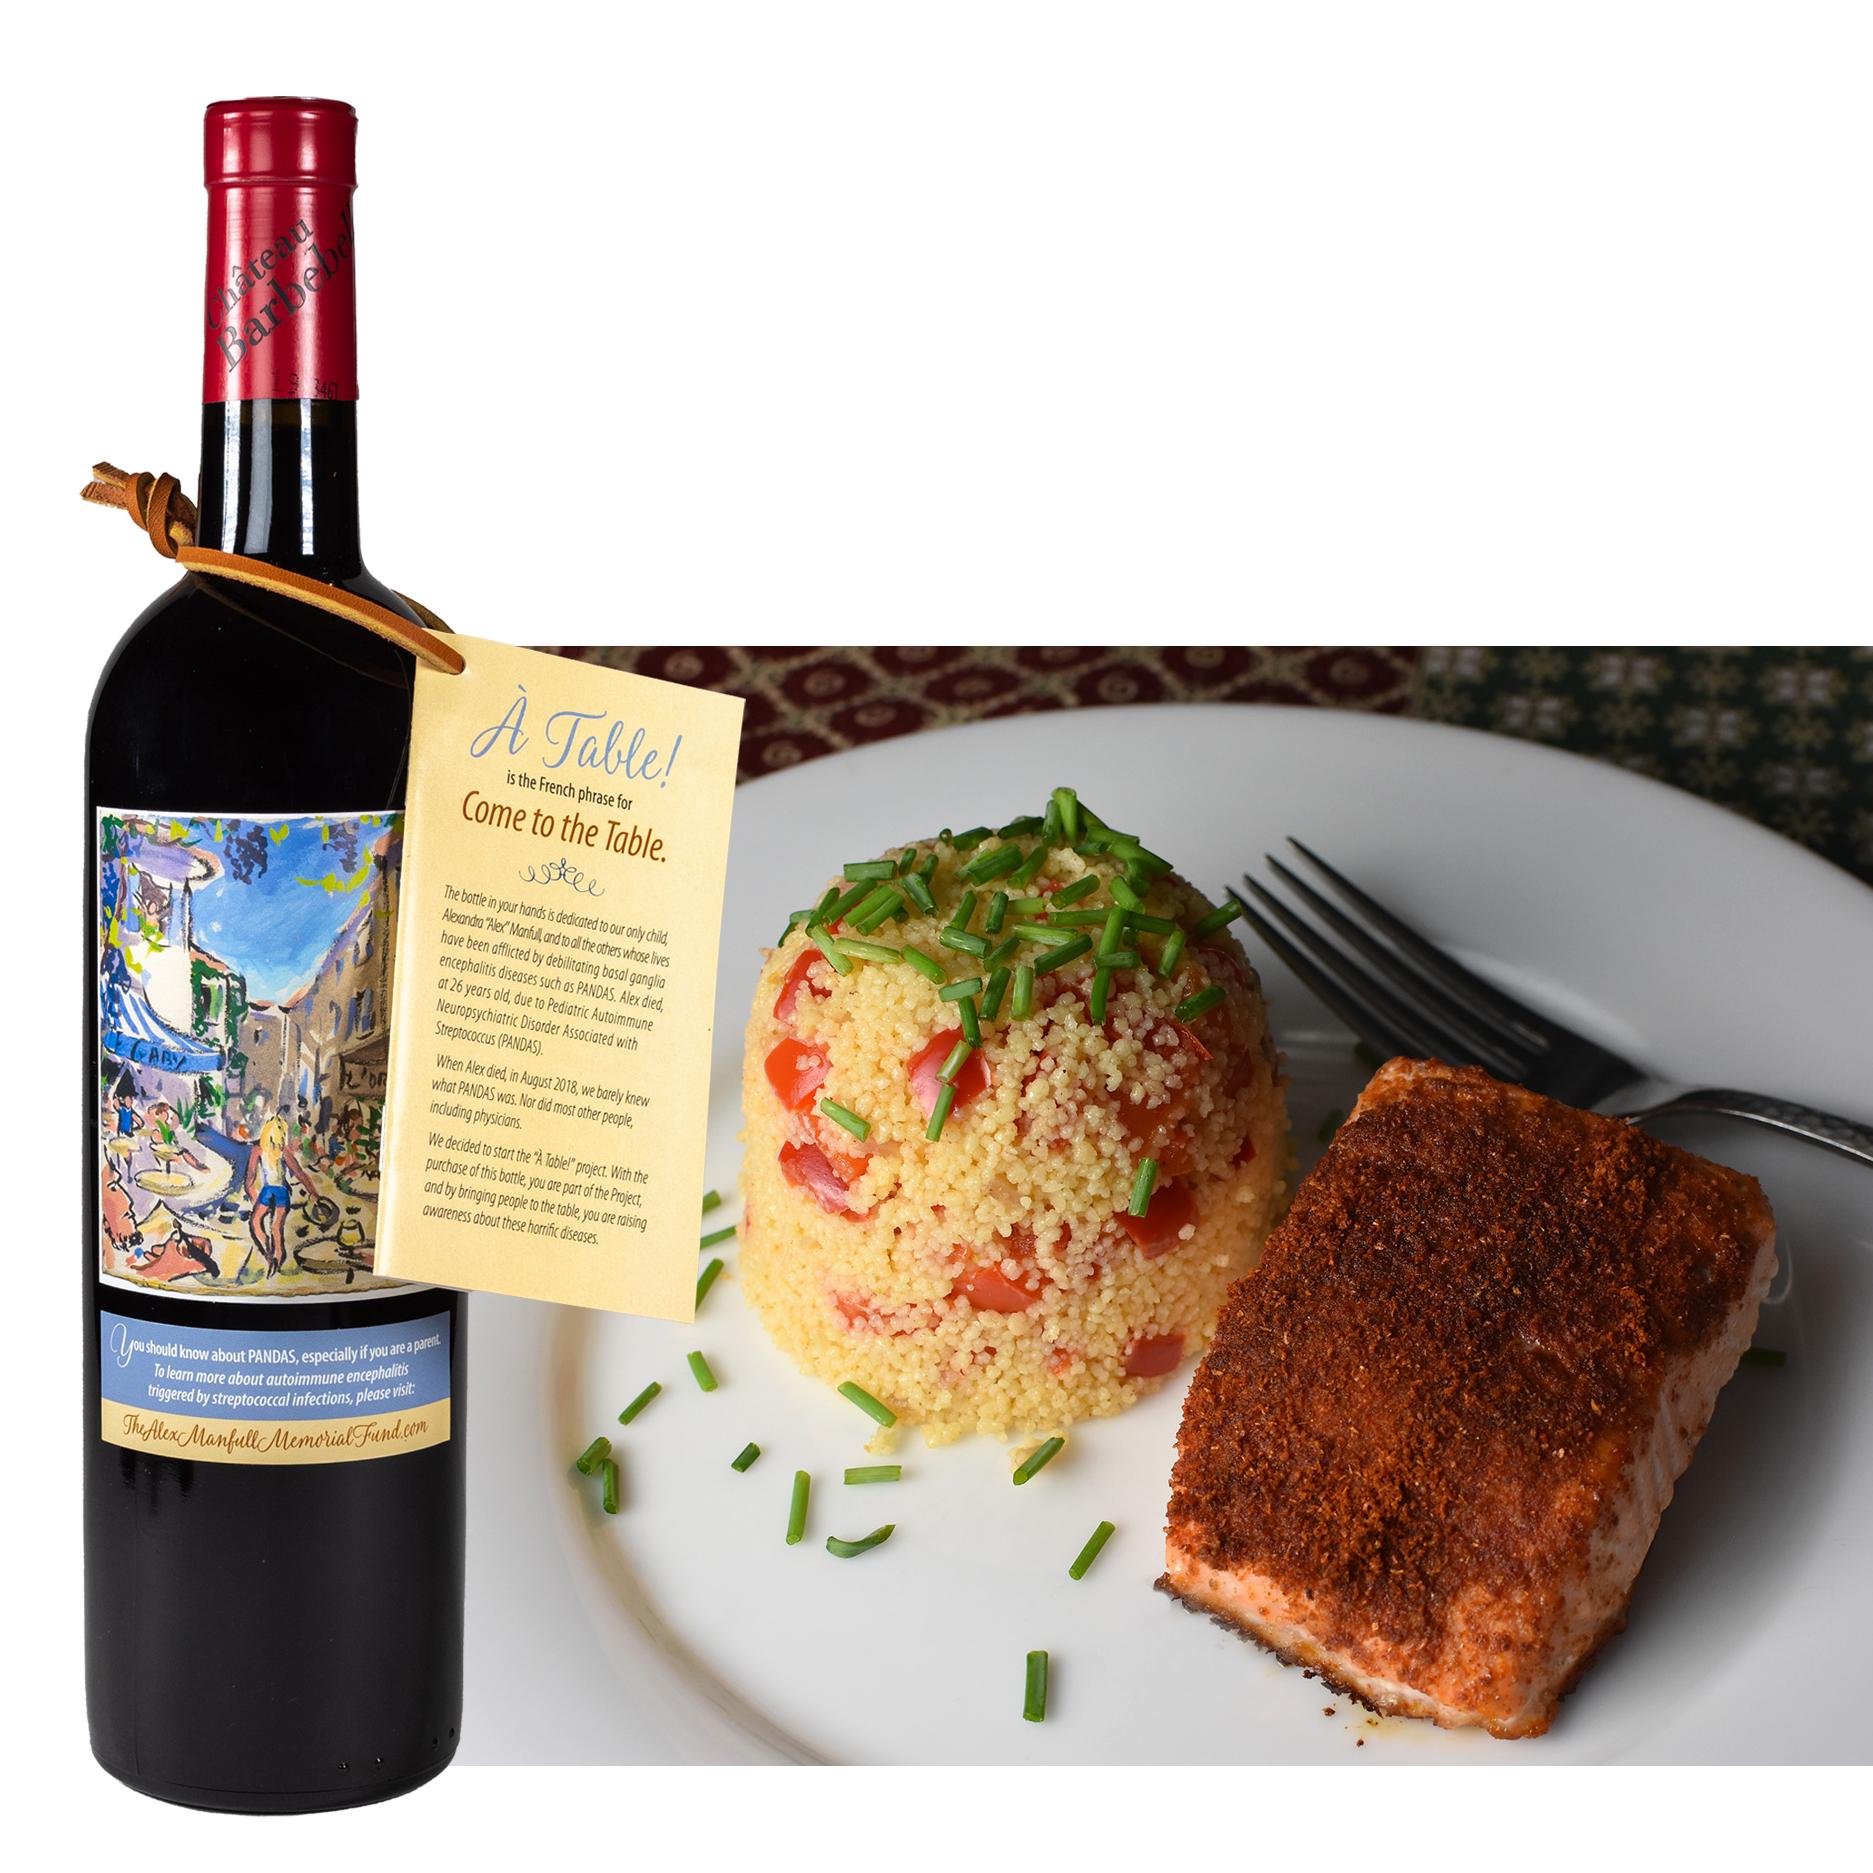 Sharing Wine and Food at the Table – November 19, 2020